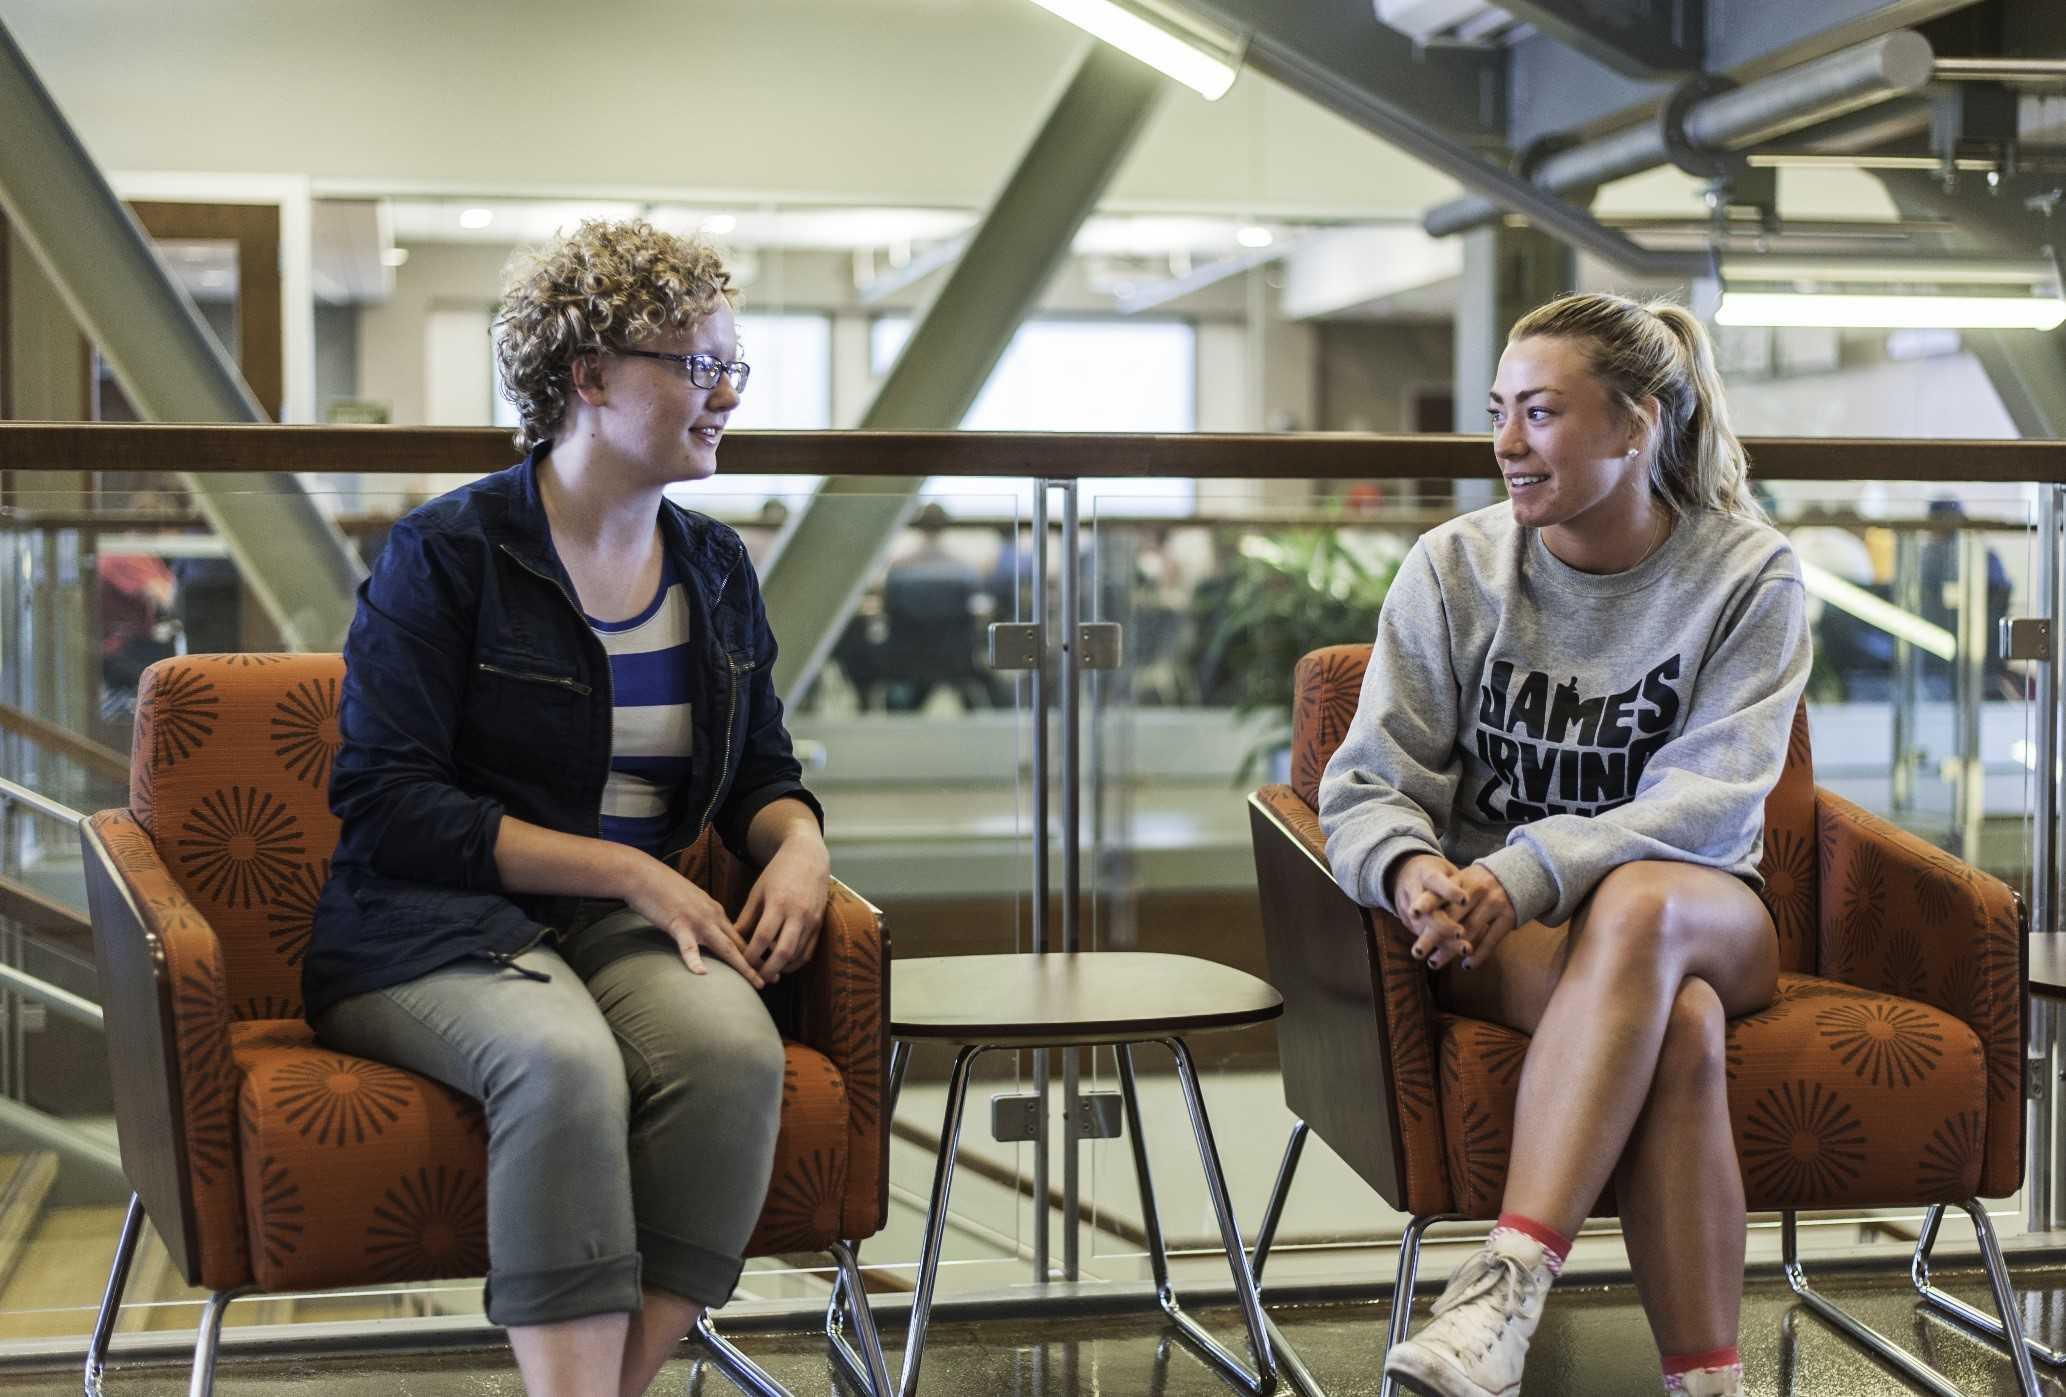 Karlie Hornberger (left) and Maureen Mikkelsen (right) worked together on a project to get more girls interested in STEM.